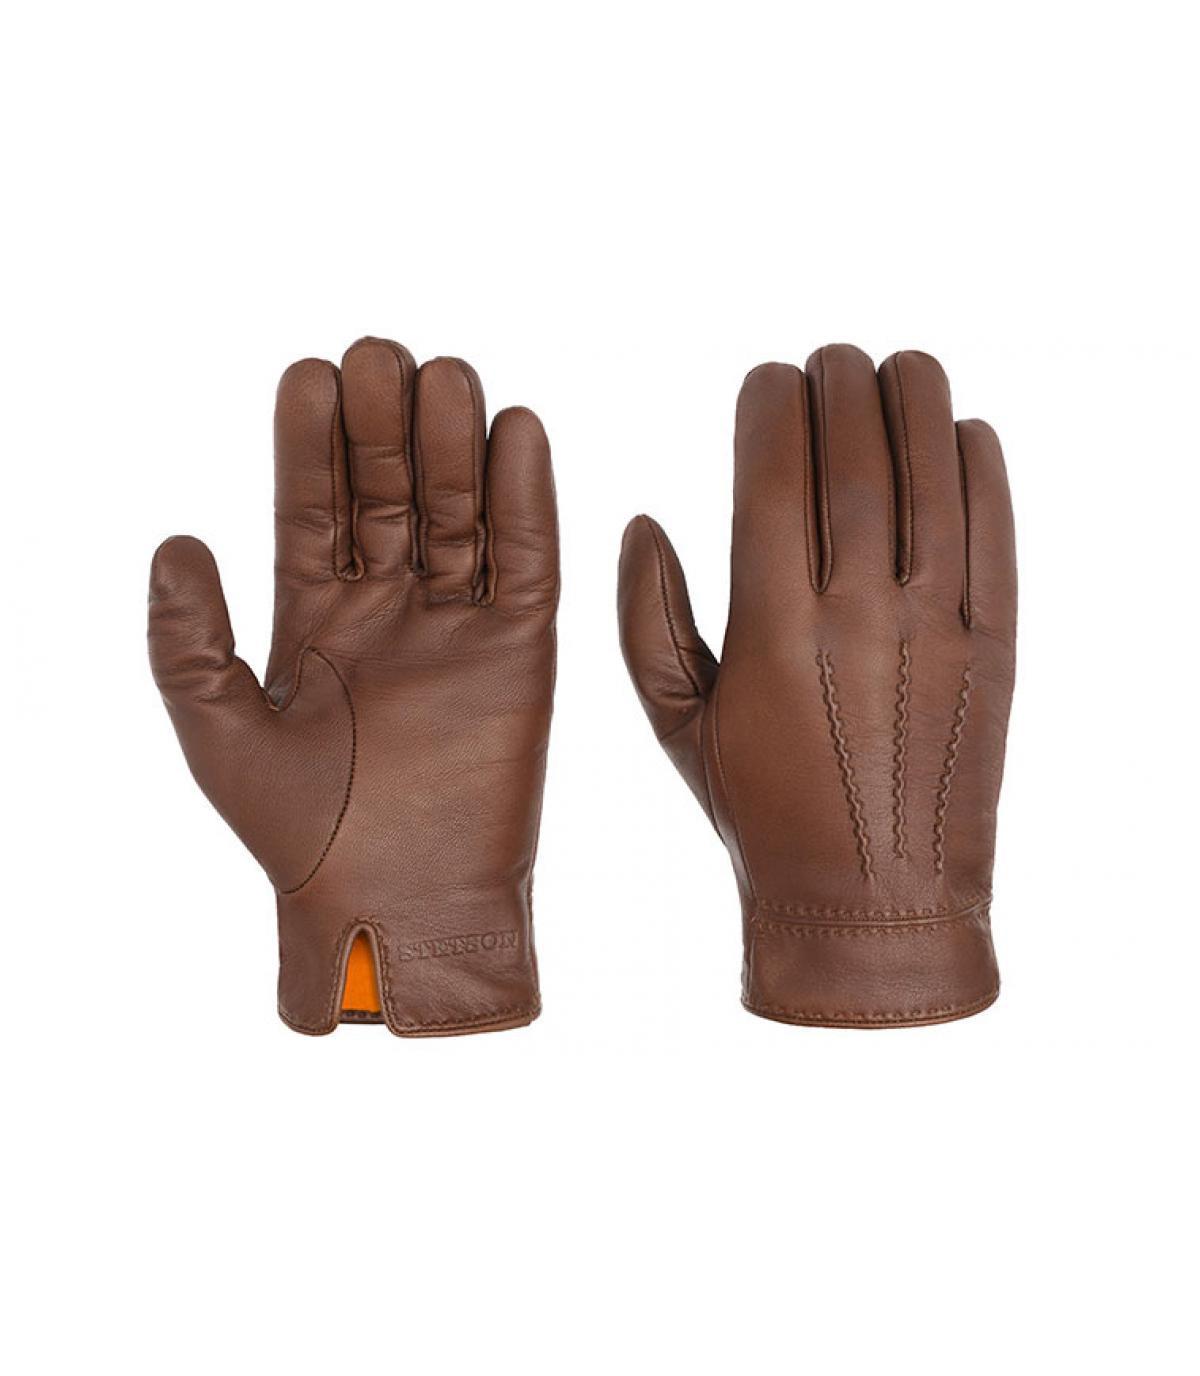 Brown guantes de cuero Stetson